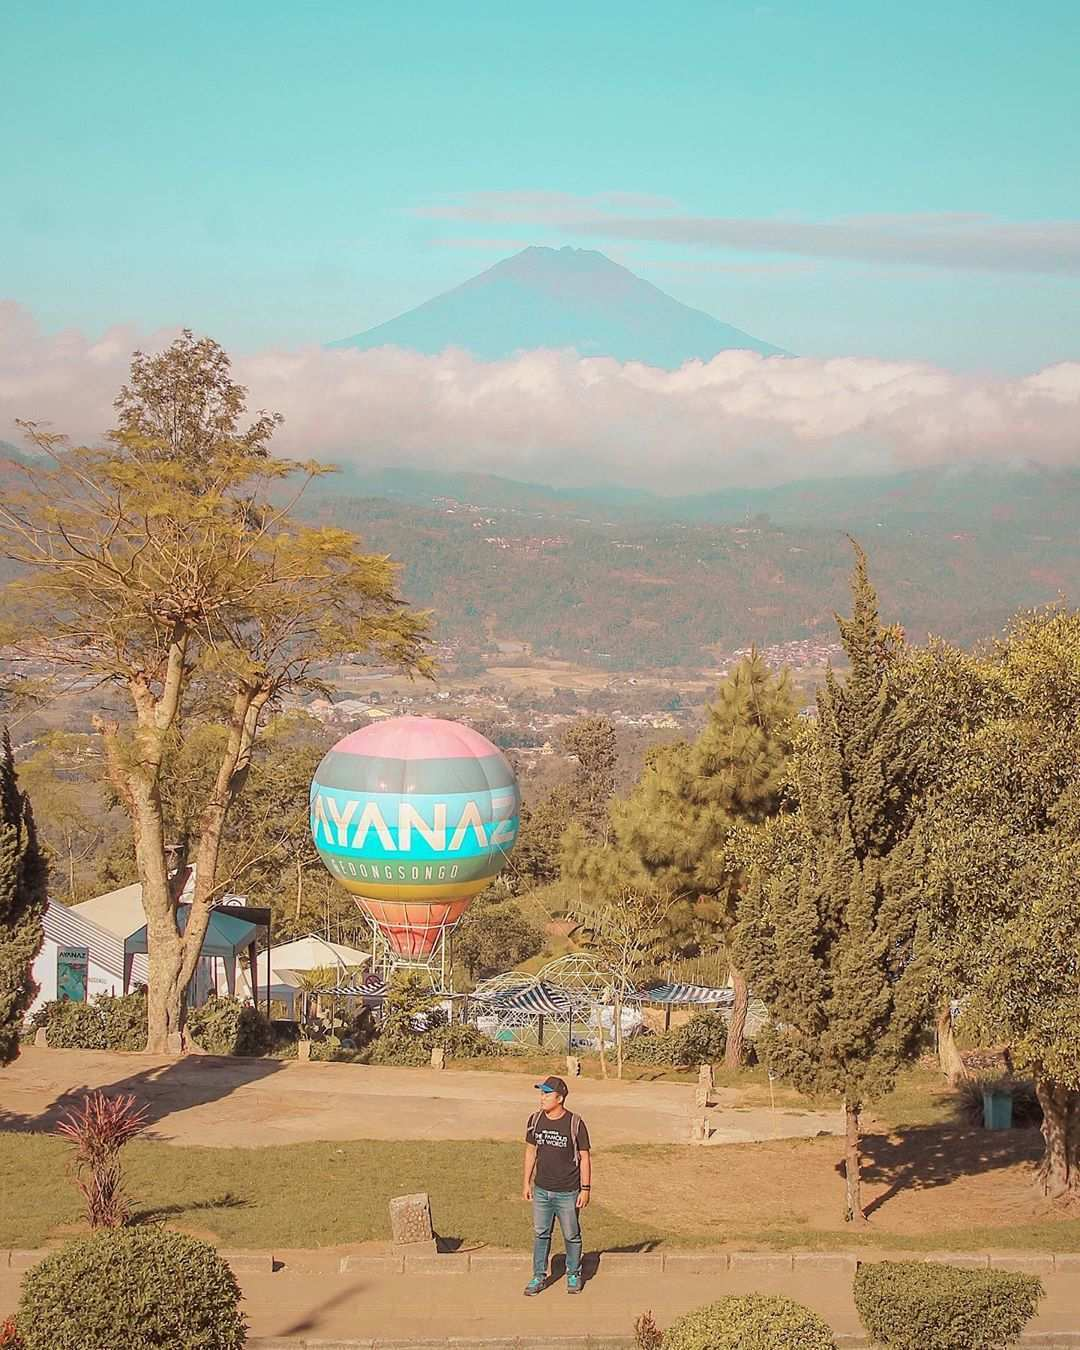 Berfoto Dengan Pemandangan Gunung di Ayanaz Gedongsongo Semarang Image From @lonardika